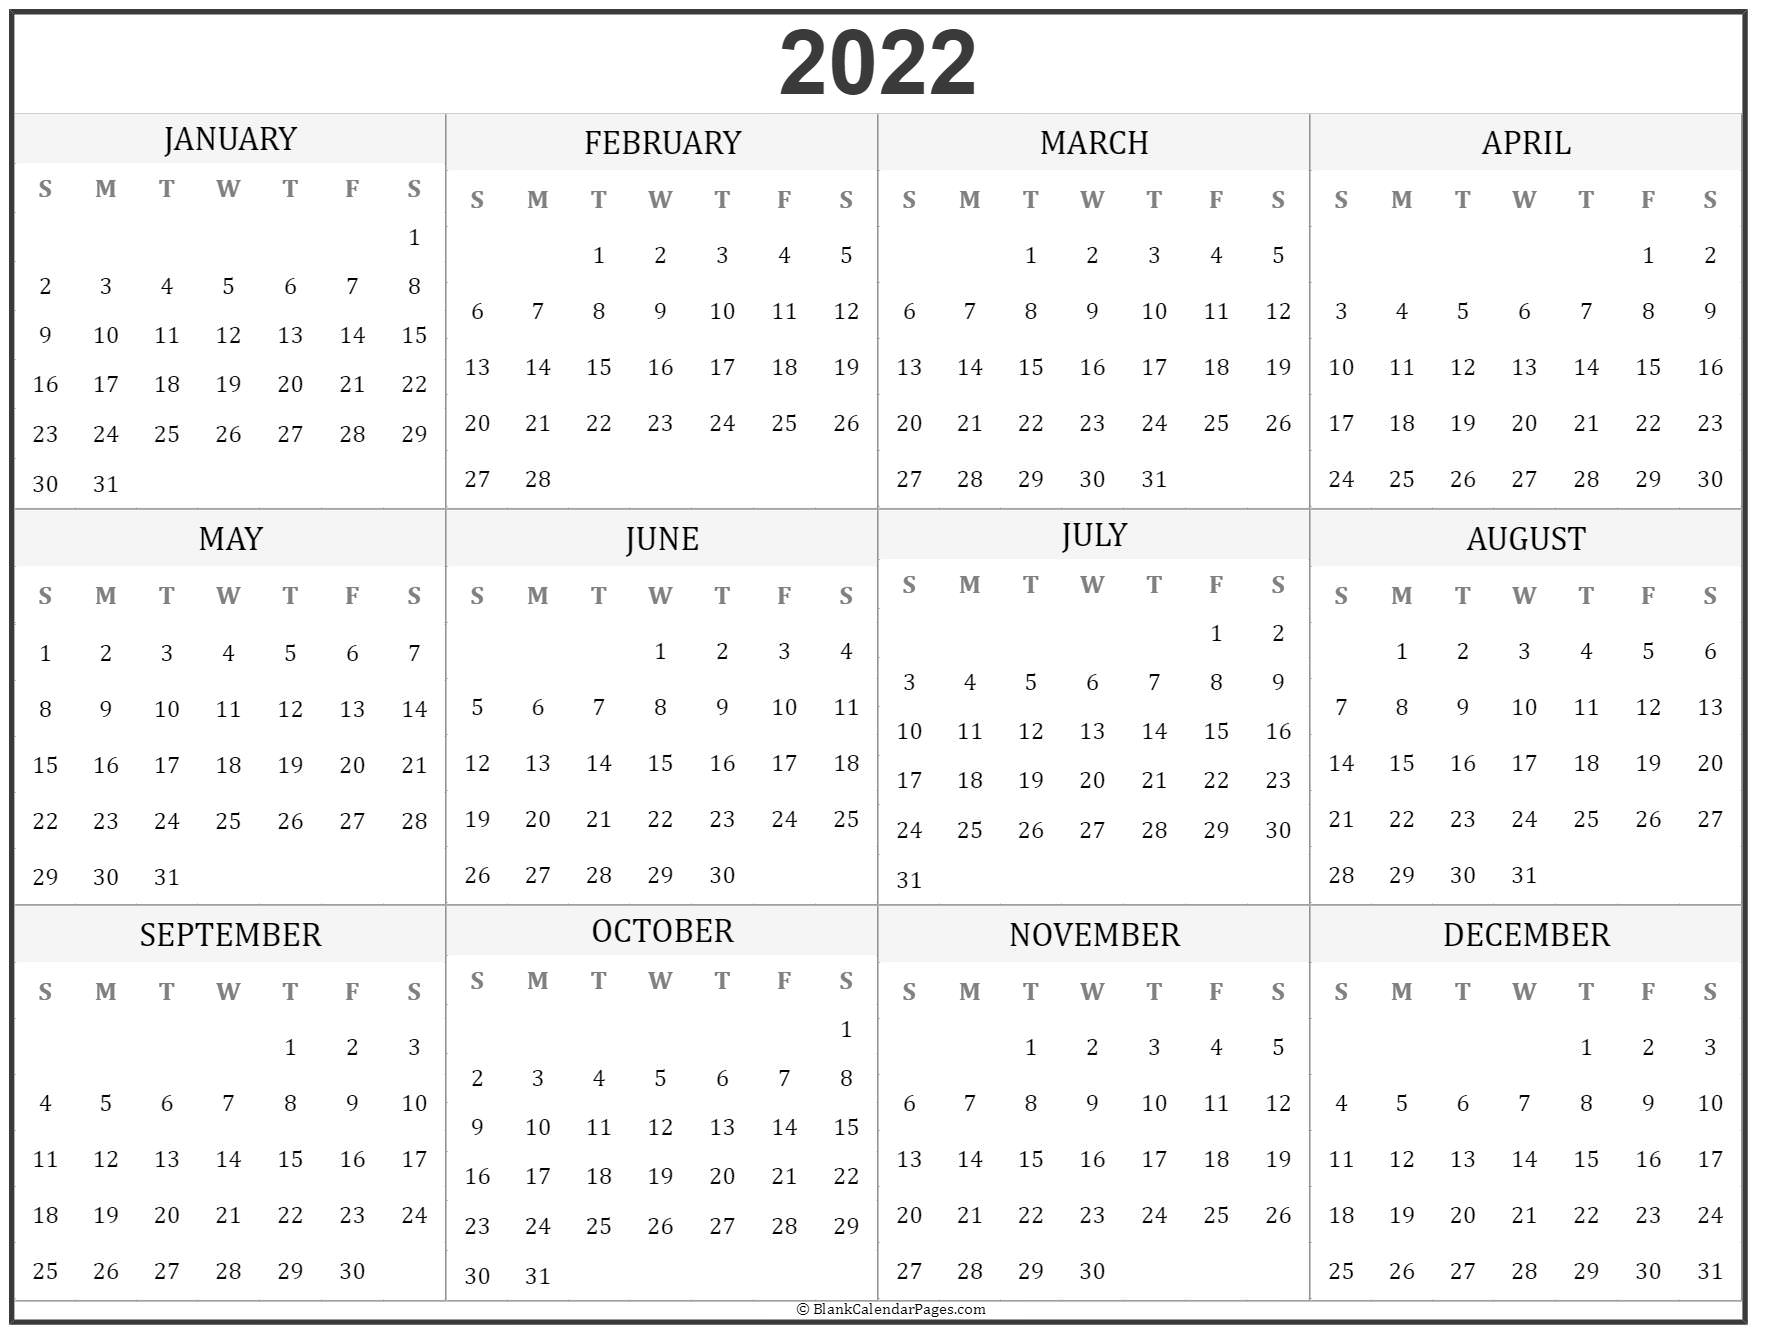 2022 year calendar | yearly printable calendar